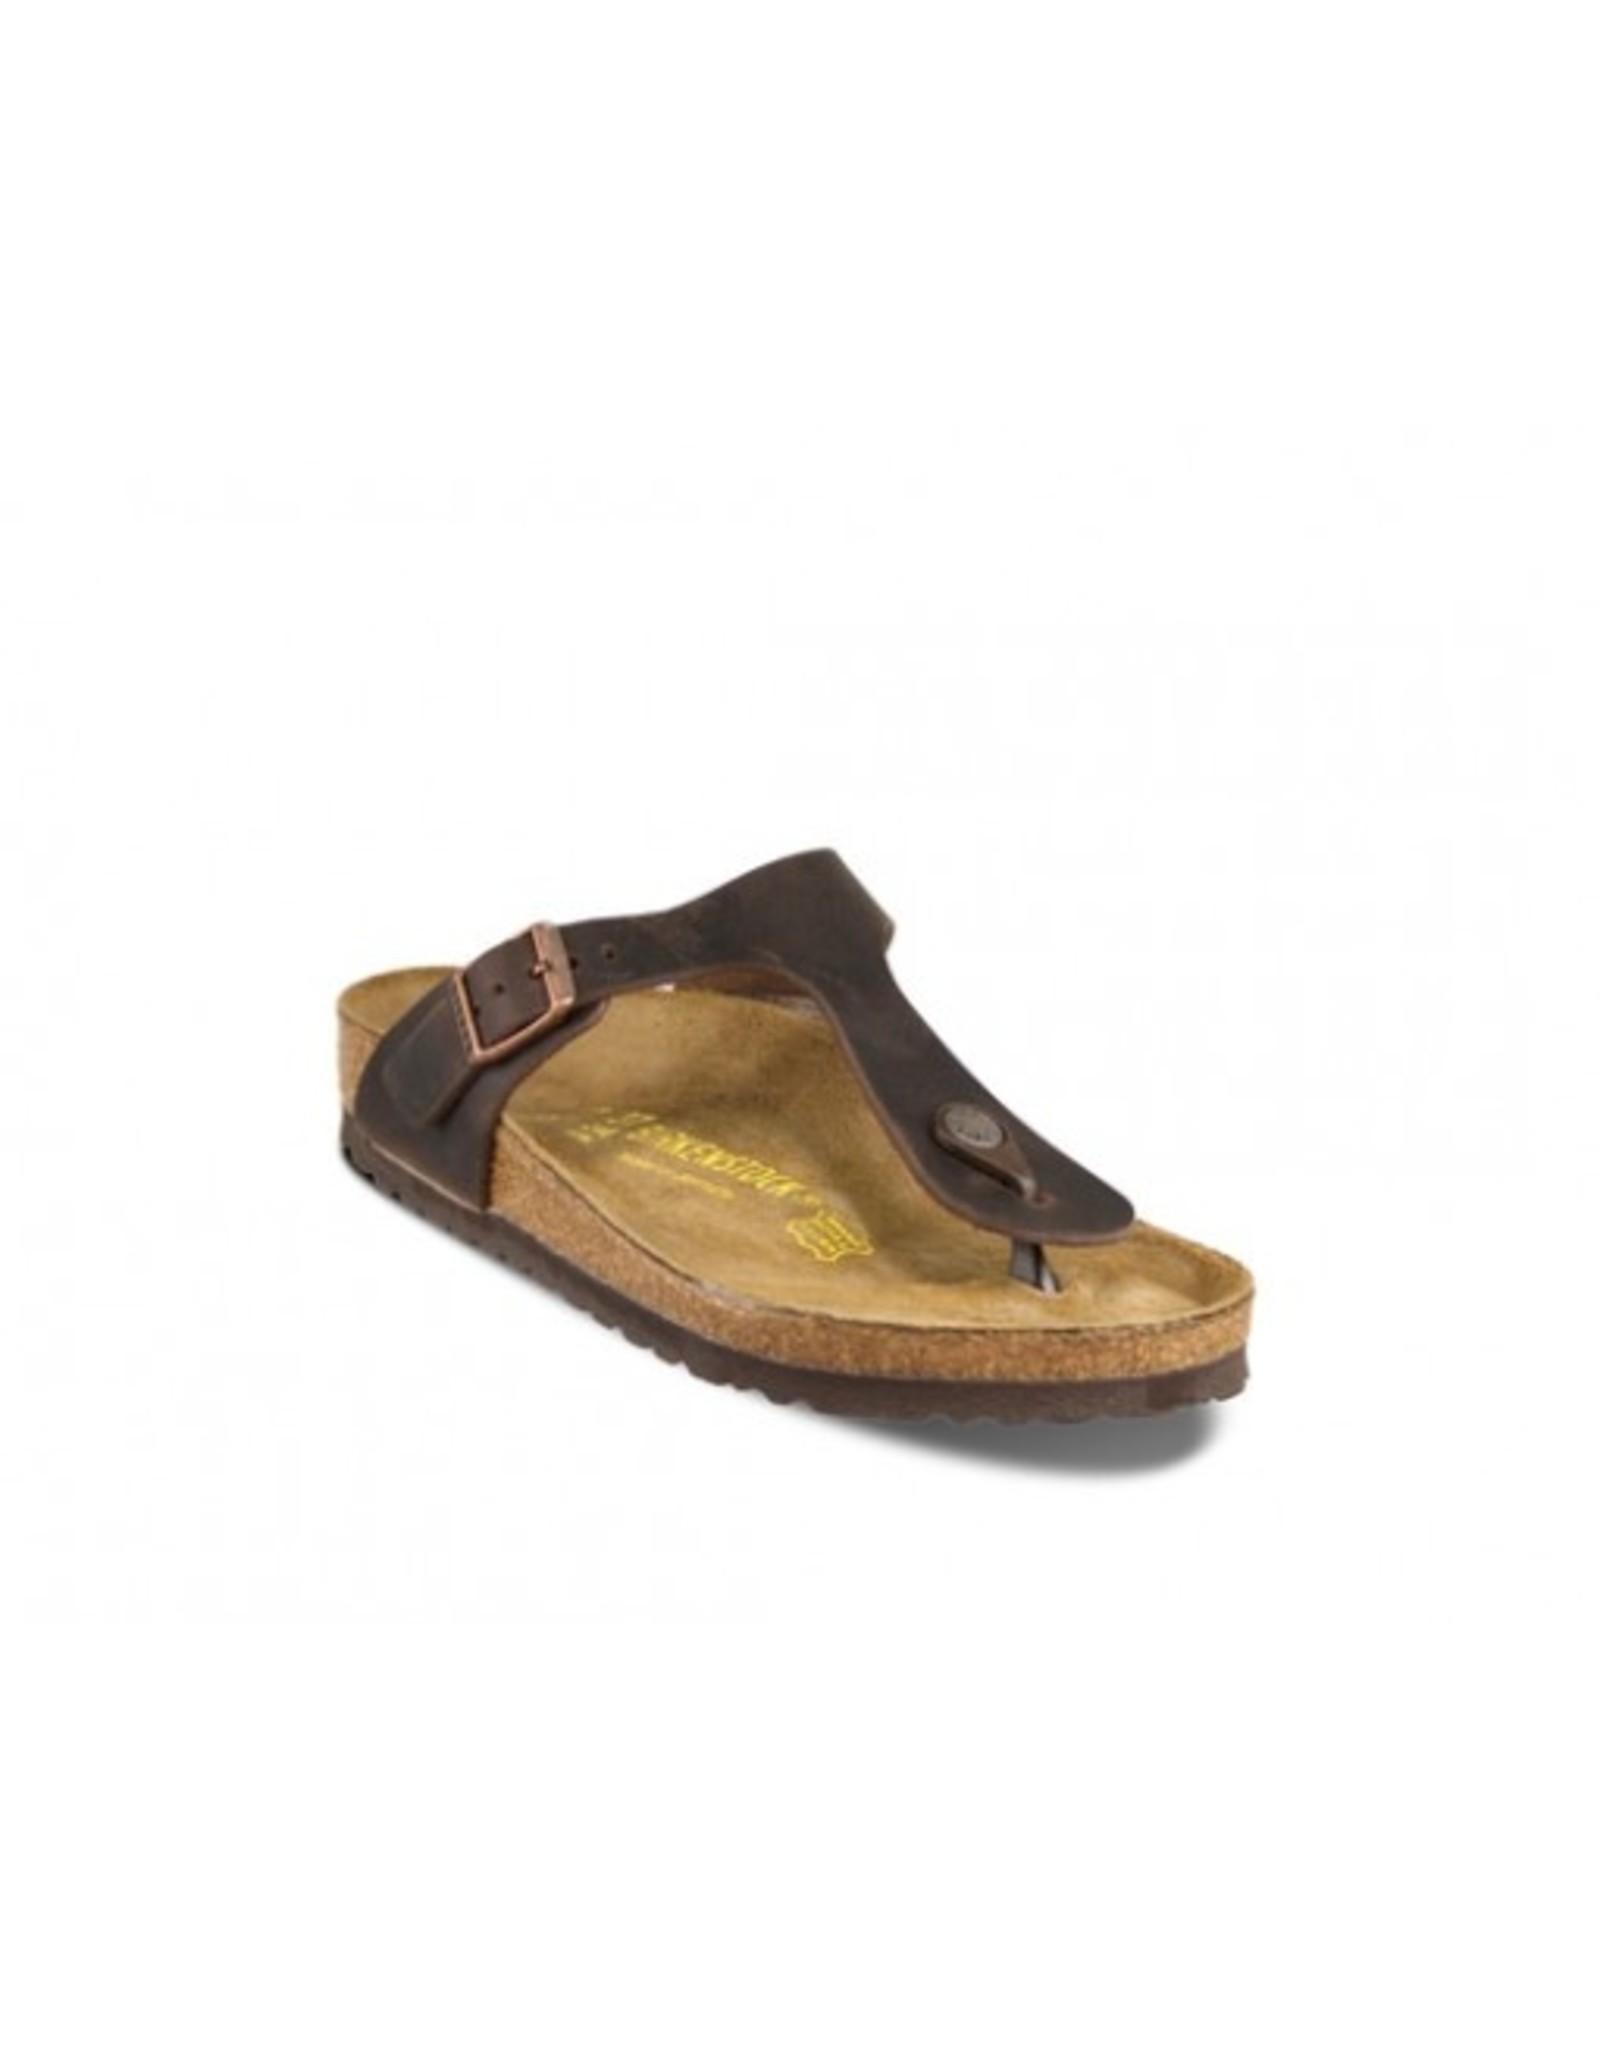 Birkenstock Gizeh Havana, Oiled Leather